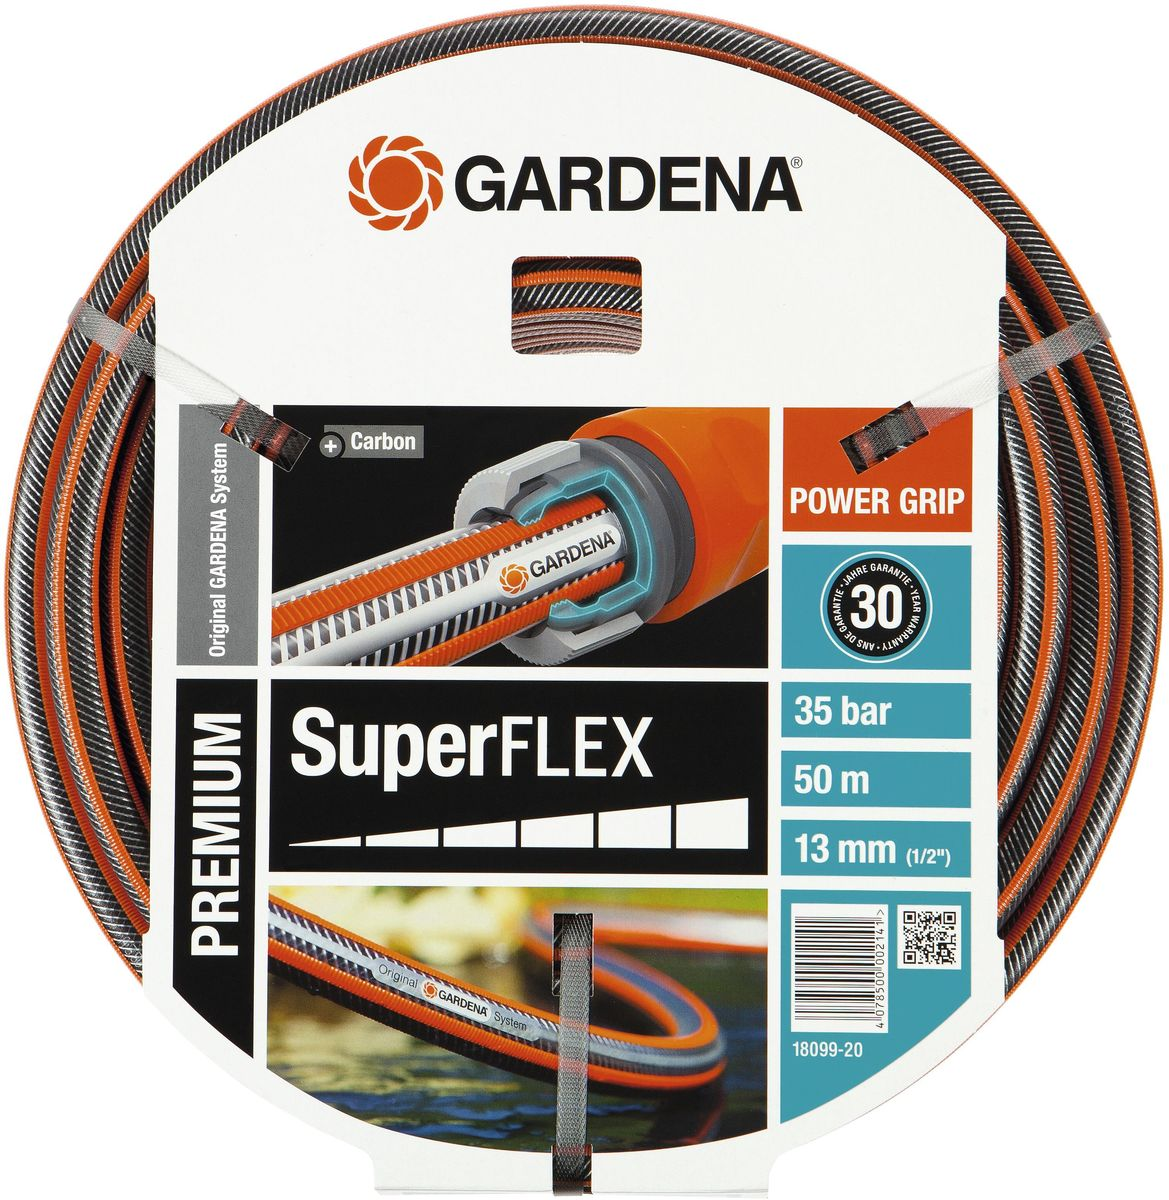 Шланг Gardena Superflex, диаметр 13 мм (1/2), длина 50 м шланг gardena superflex